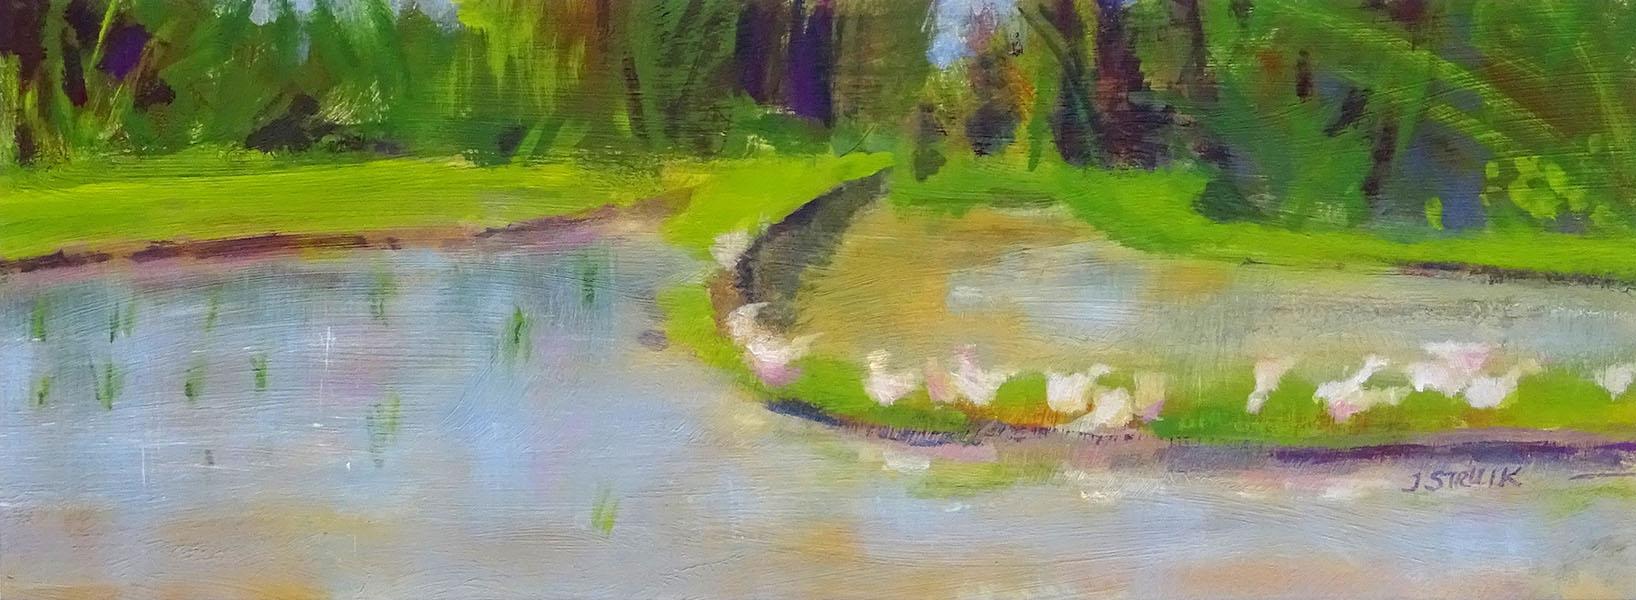 Rijstveld, Bali, 14 x 38, acryl op papier, € 175,-